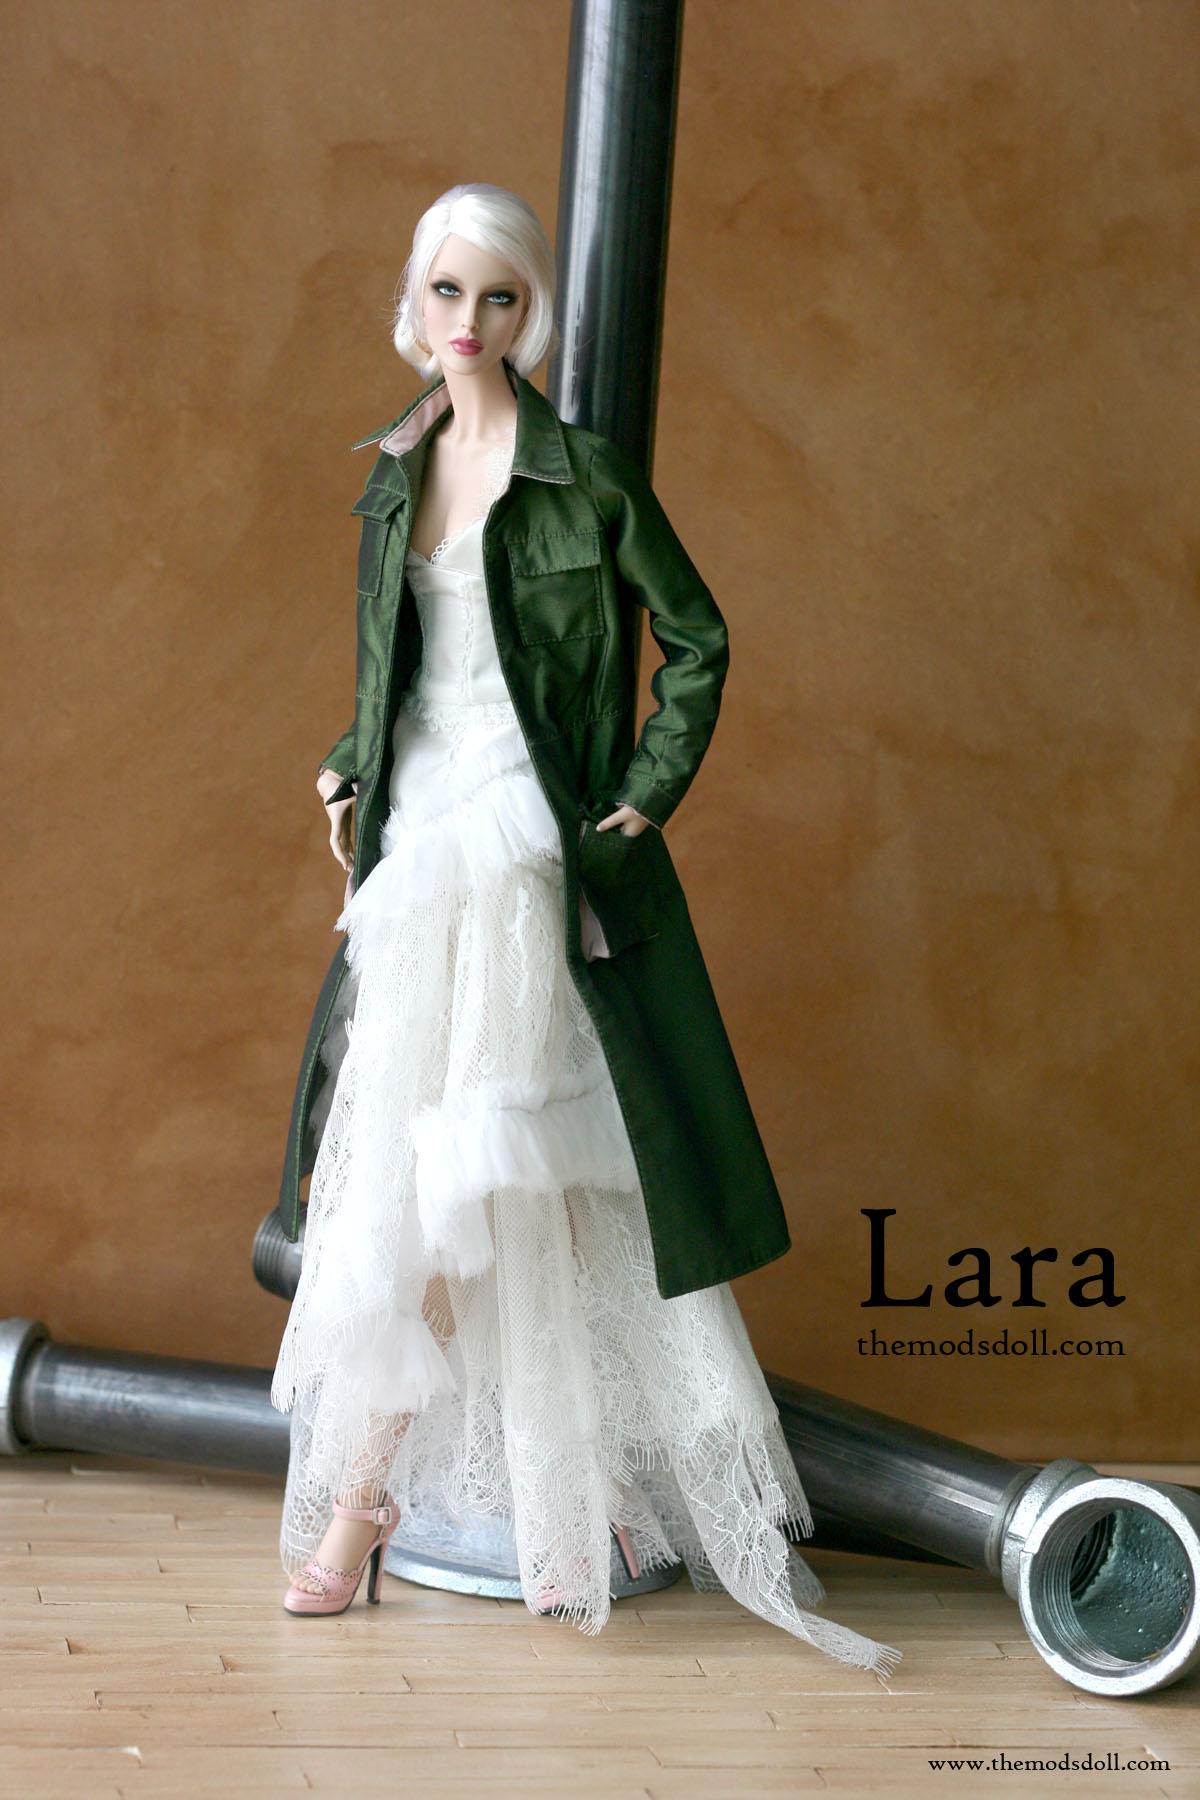 Les mannequins Modsdoll - P 1 Brontë - P3 Chloe - P4 Asali - Page 4 17Lara2